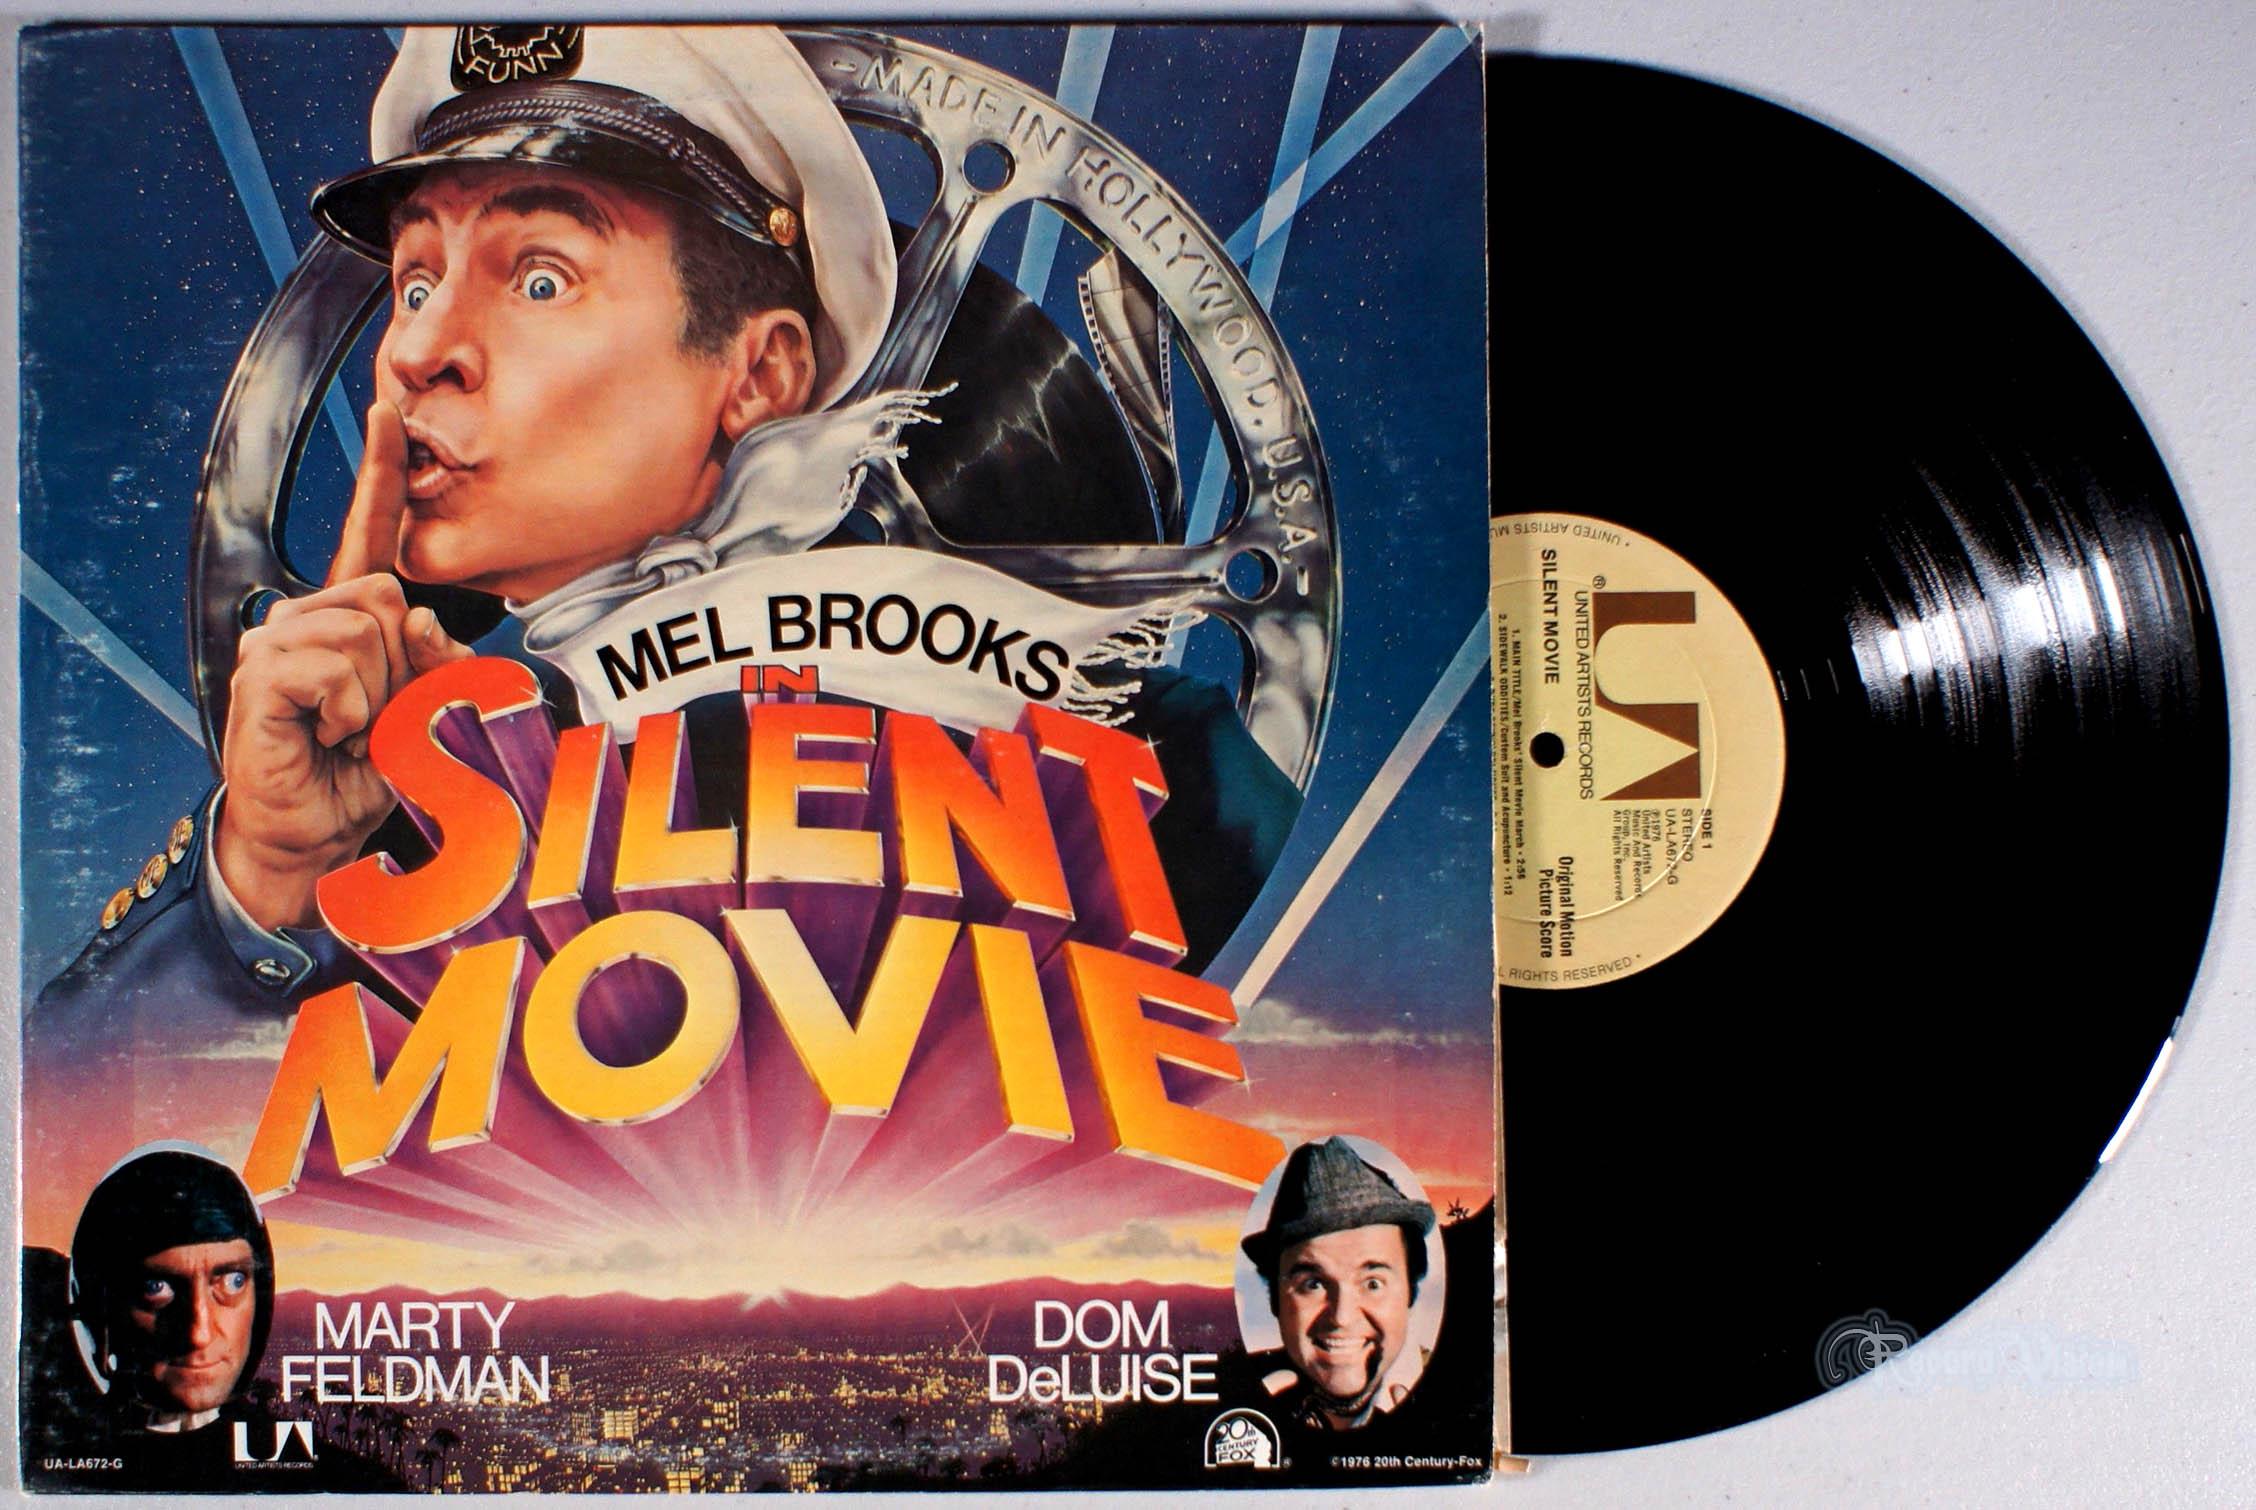 MEL BROOKS - Silent Movie - LP